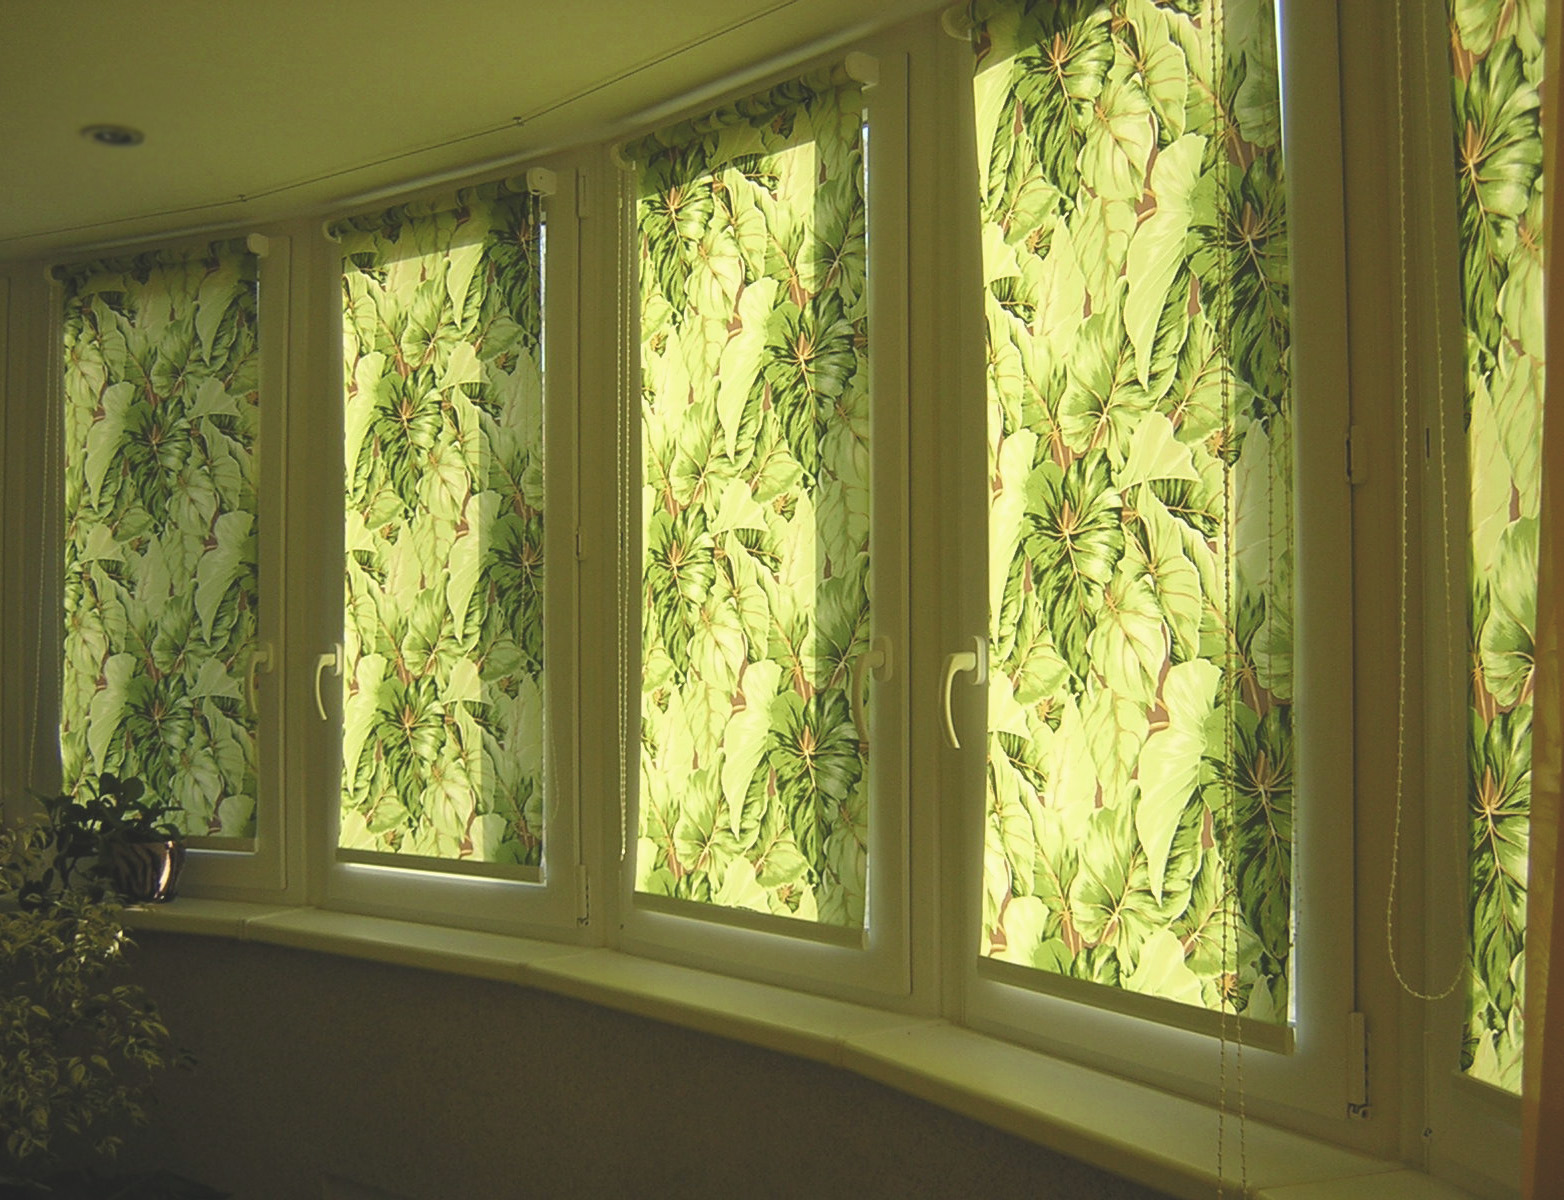 тканевые жалюзи на окнах